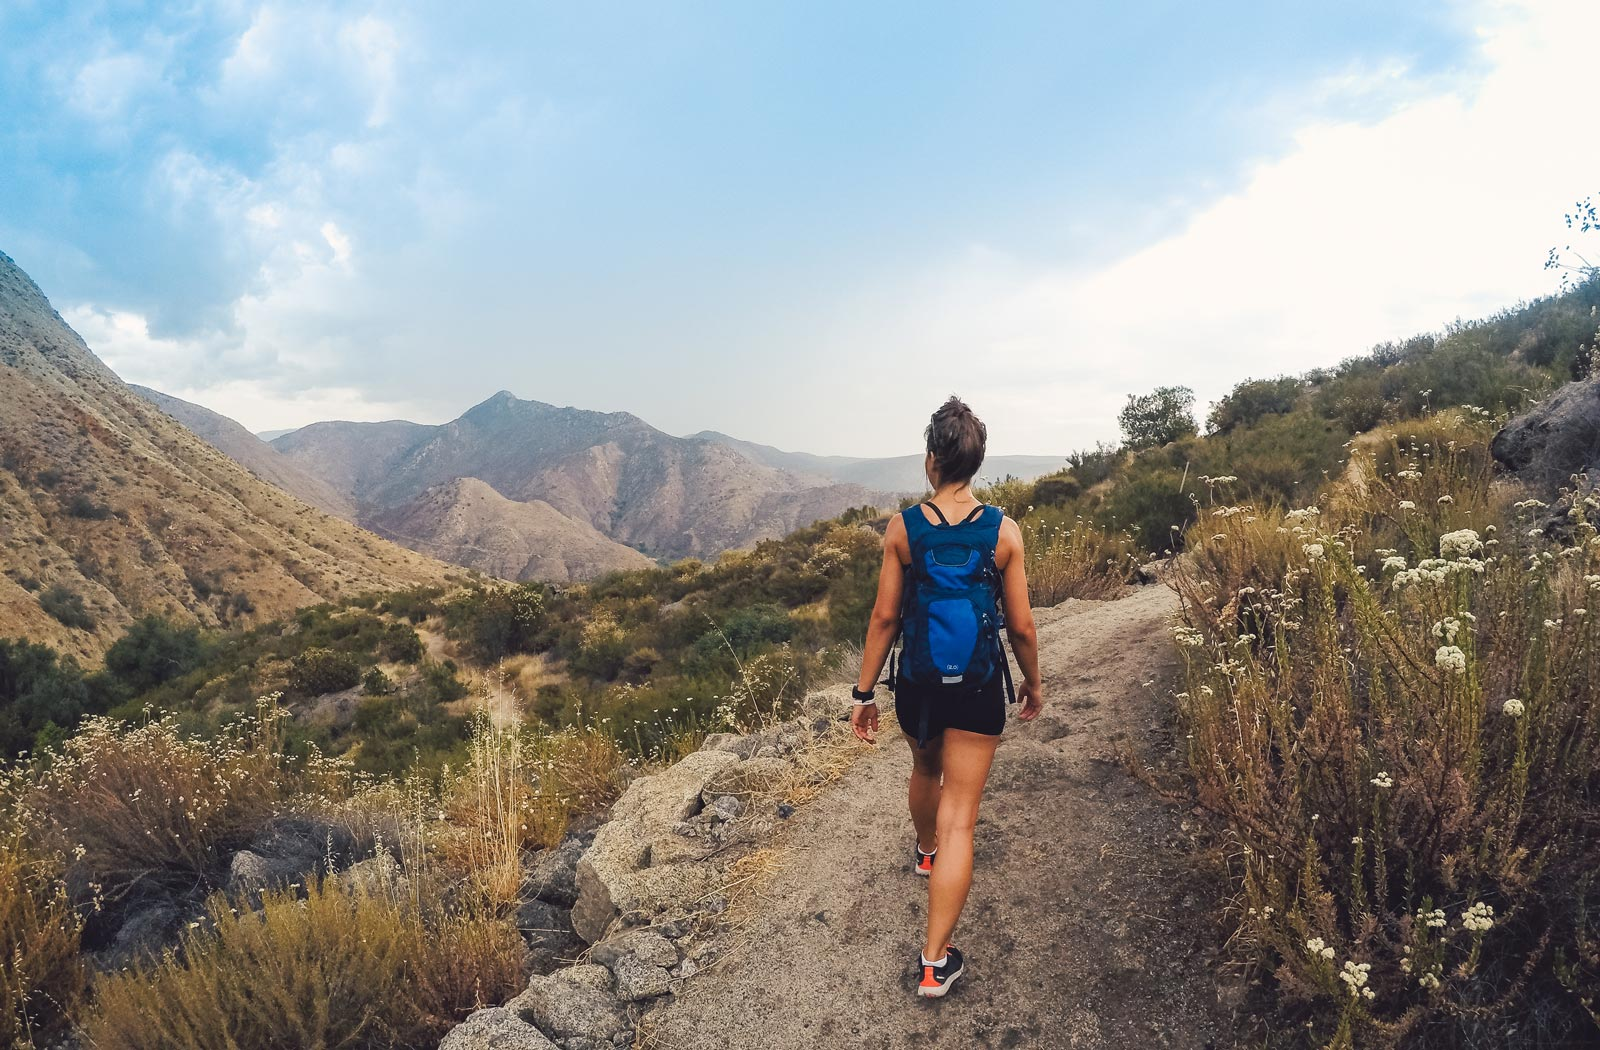 Woman Hiking Cedar Creek - Top Things to Do in Diego